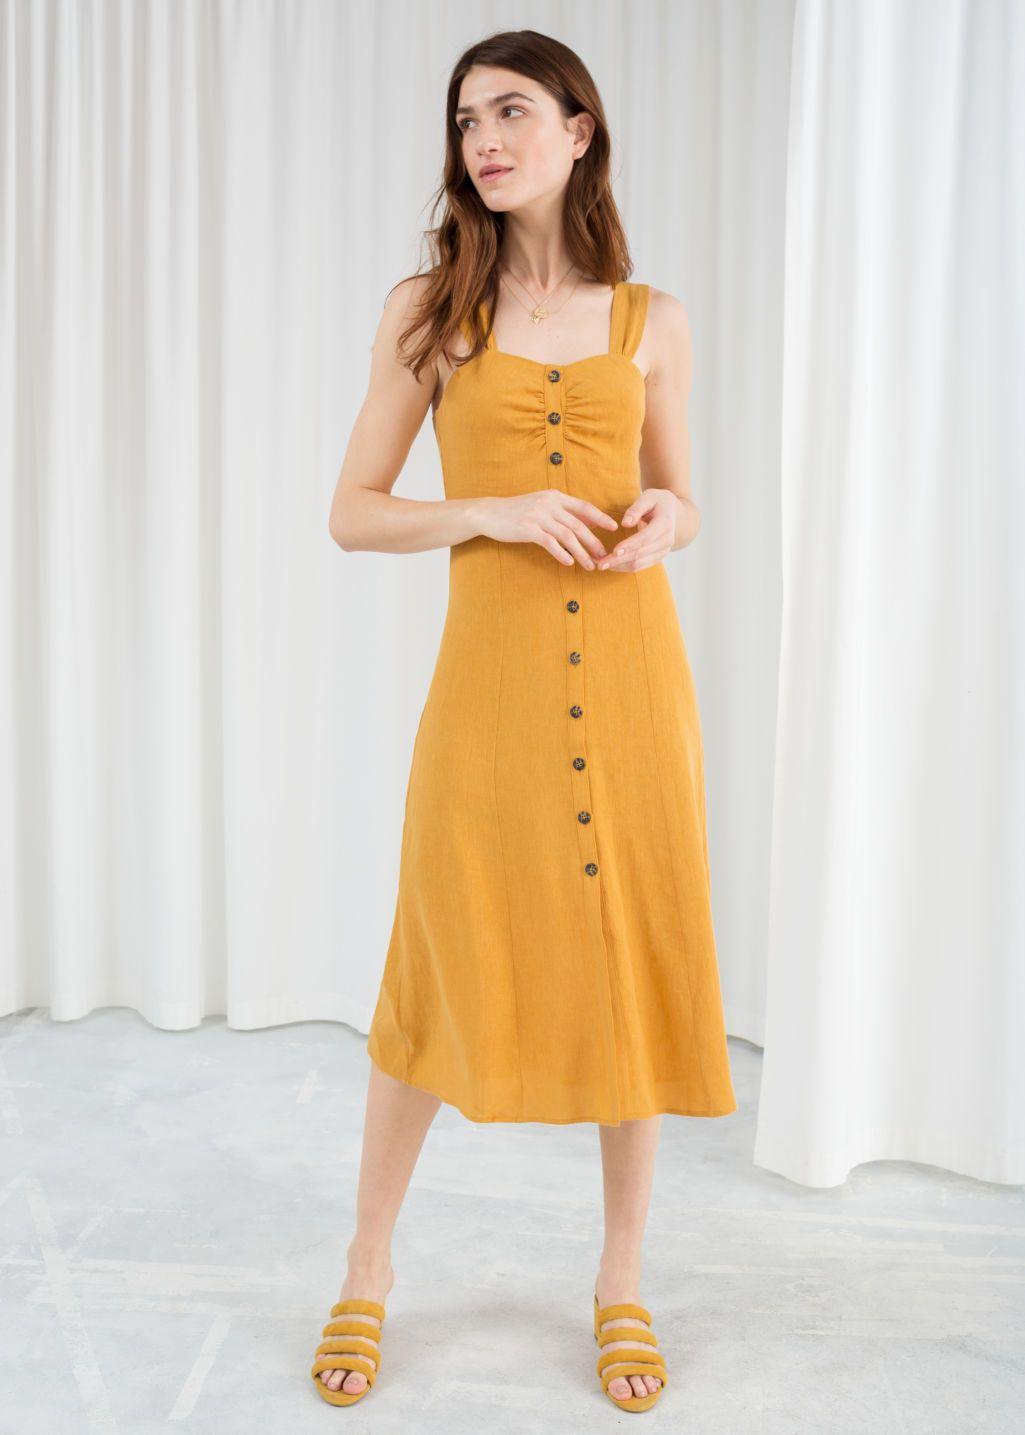 Linen blend midi dress yellow midi dress womens yellow